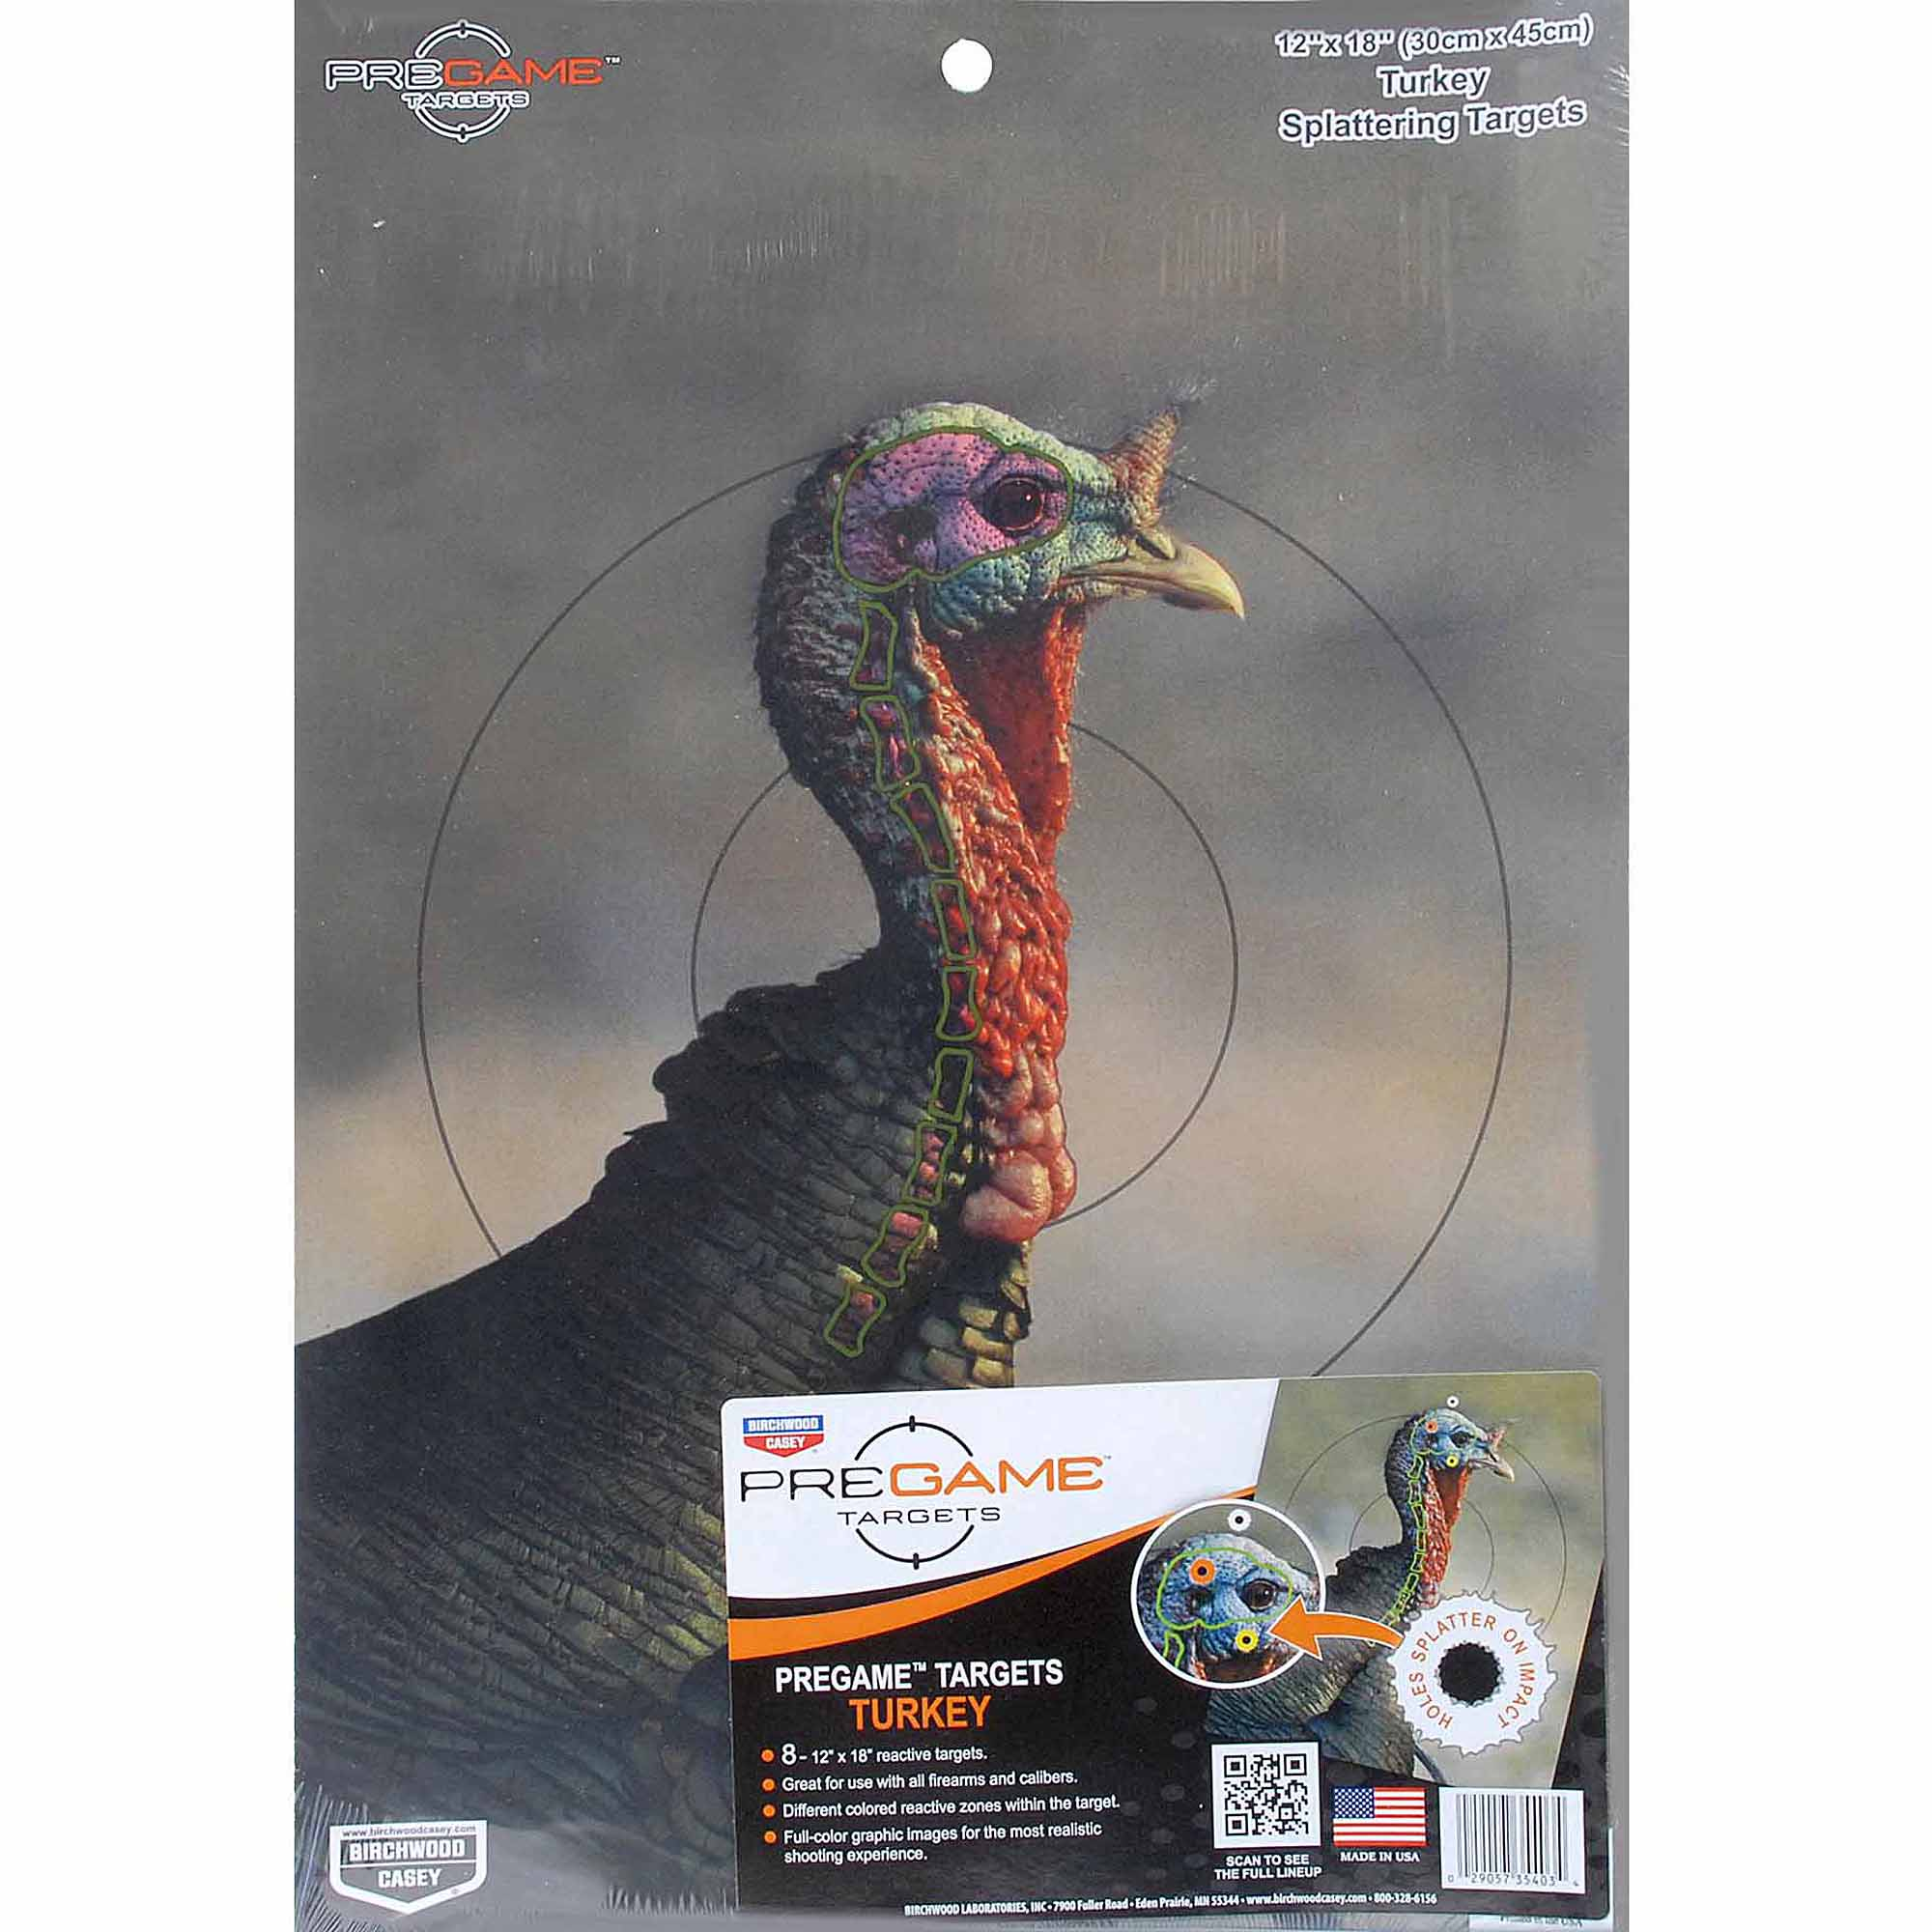 PREGAME® 12˝ x 18˝ Turkey Target - 8 targets